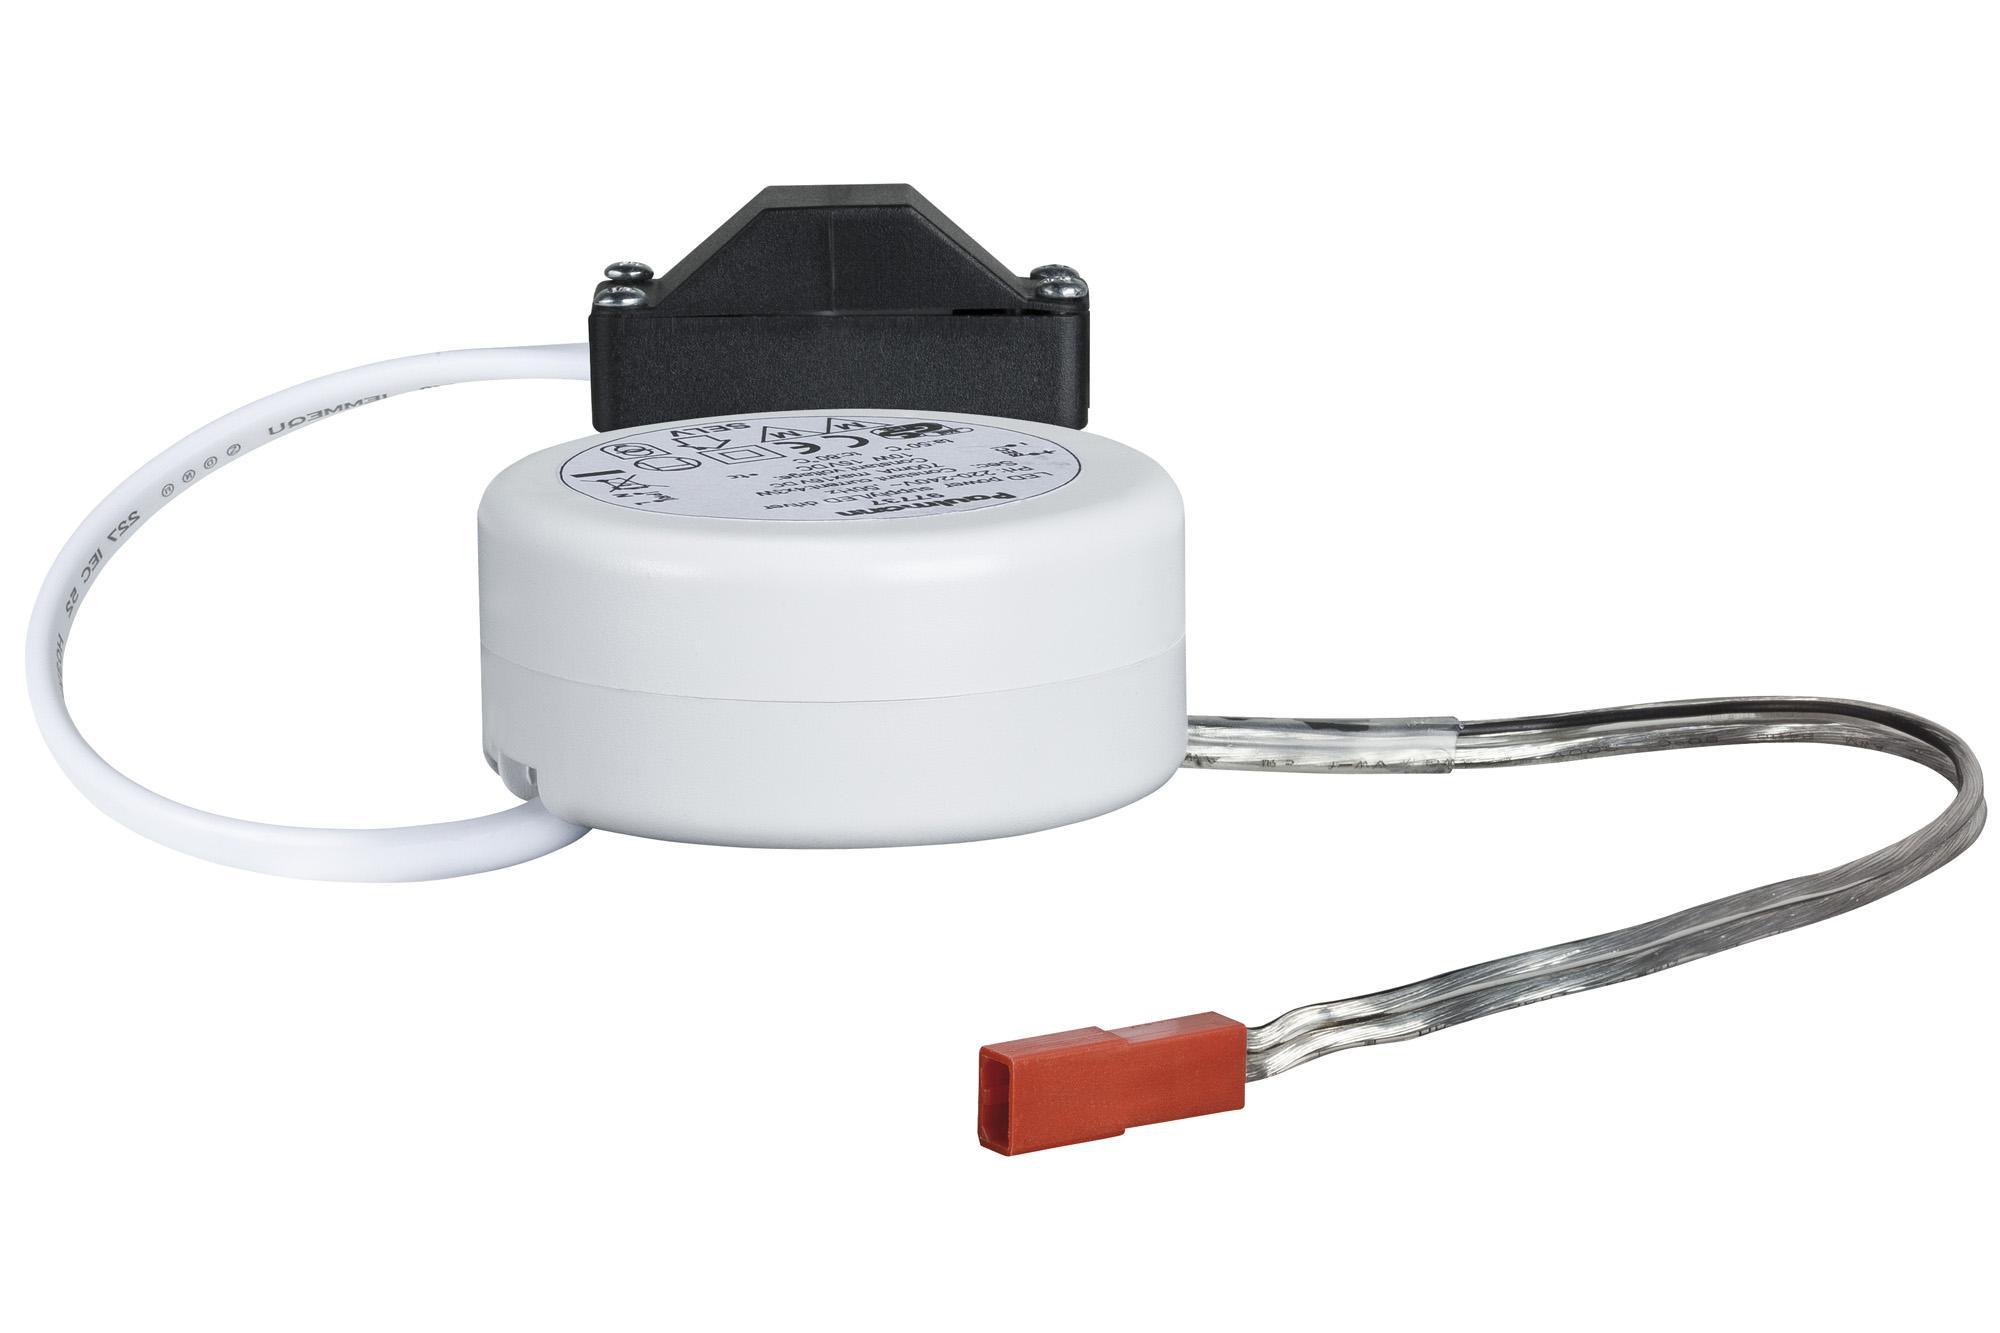 paulmann led disc power supply konstantstrom 700ma max 12w online kaufen im voltus. Black Bedroom Furniture Sets. Home Design Ideas